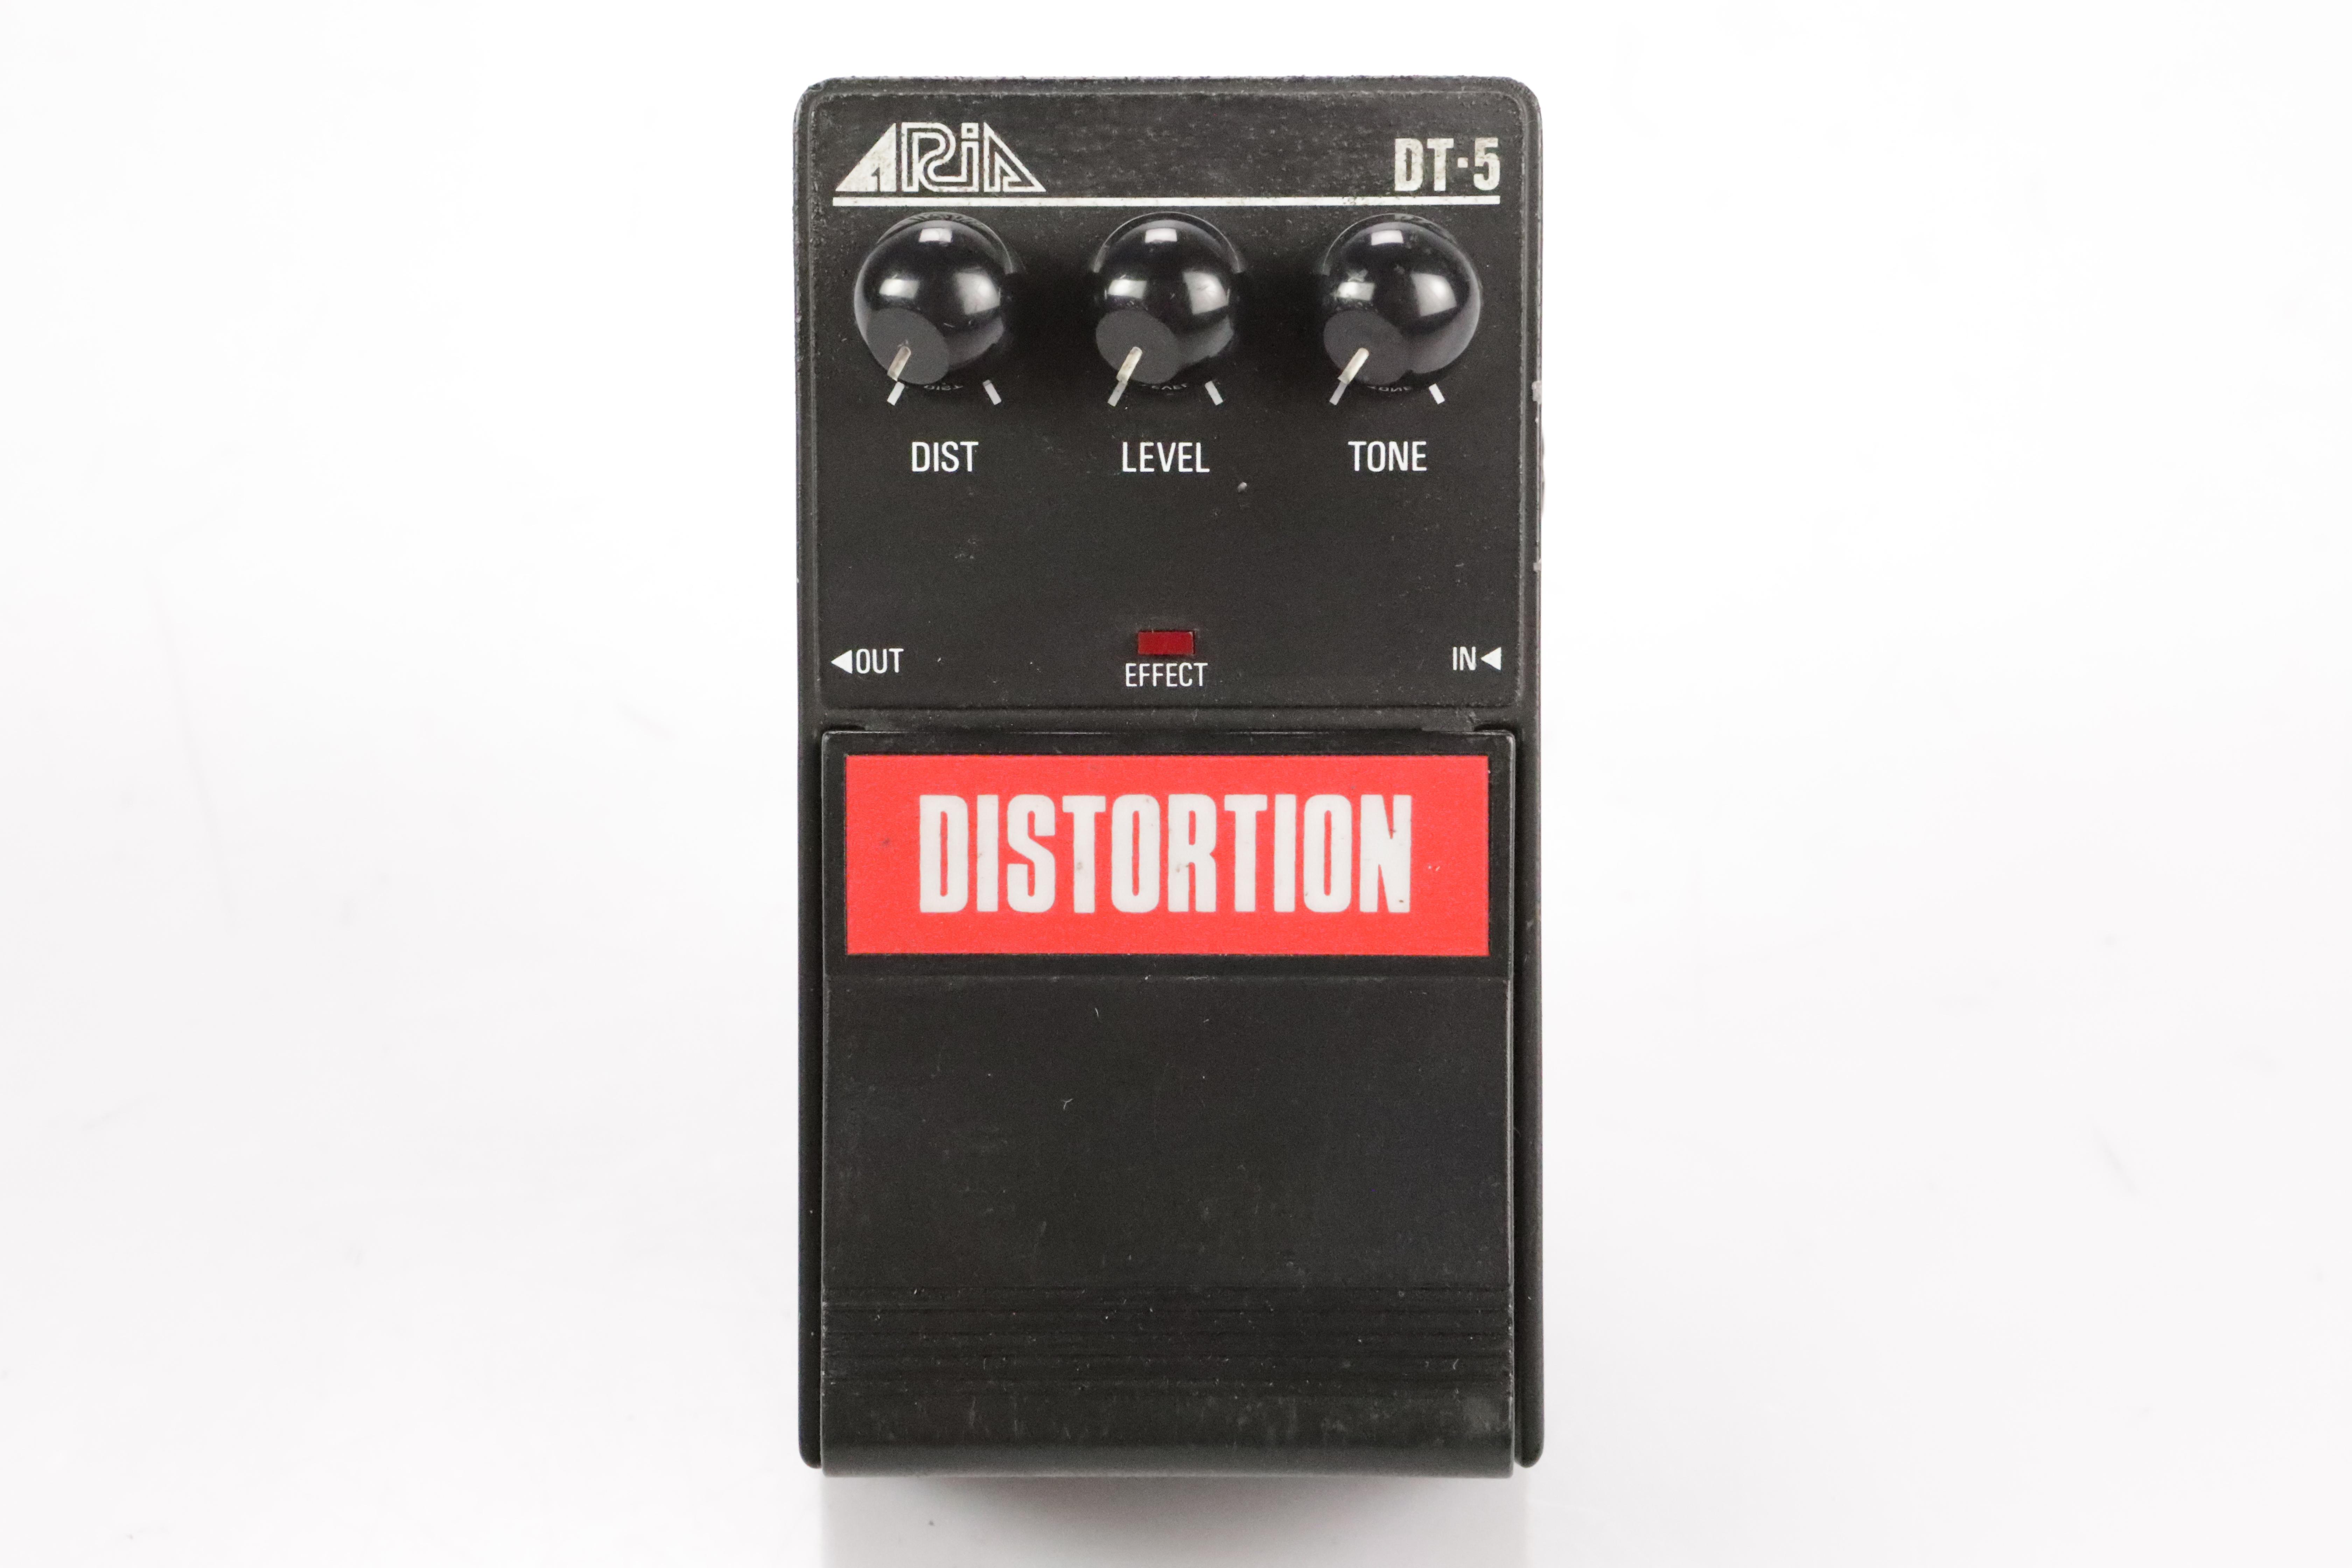 Aria DT-5 Distortion Guitar Effect Pedal w/ 2 Patch Cables DT5 #34707